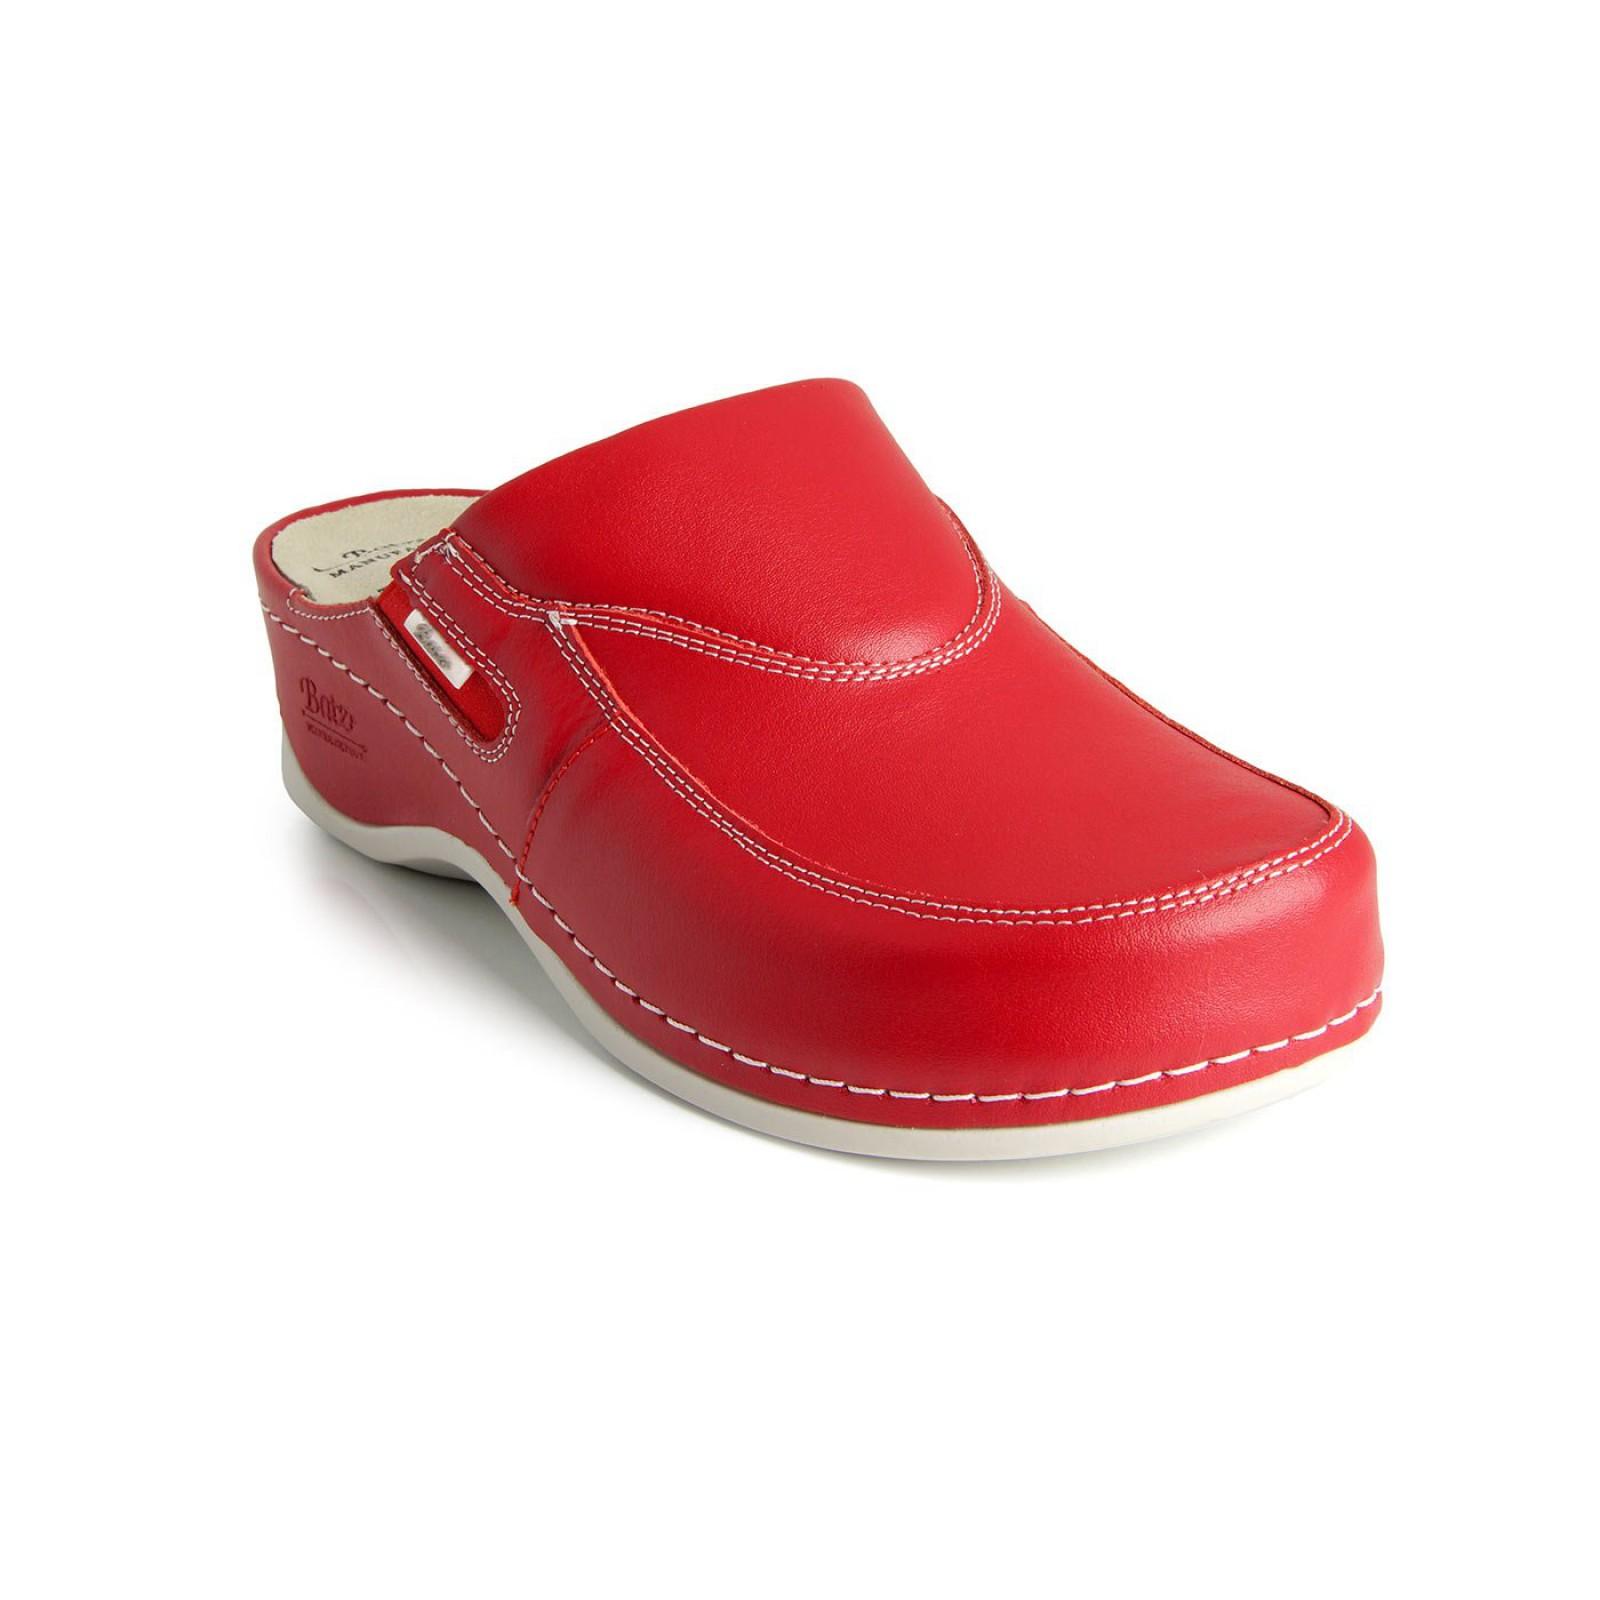 98c3166da4 Batz FC10 piros női klumpa - Női papucs